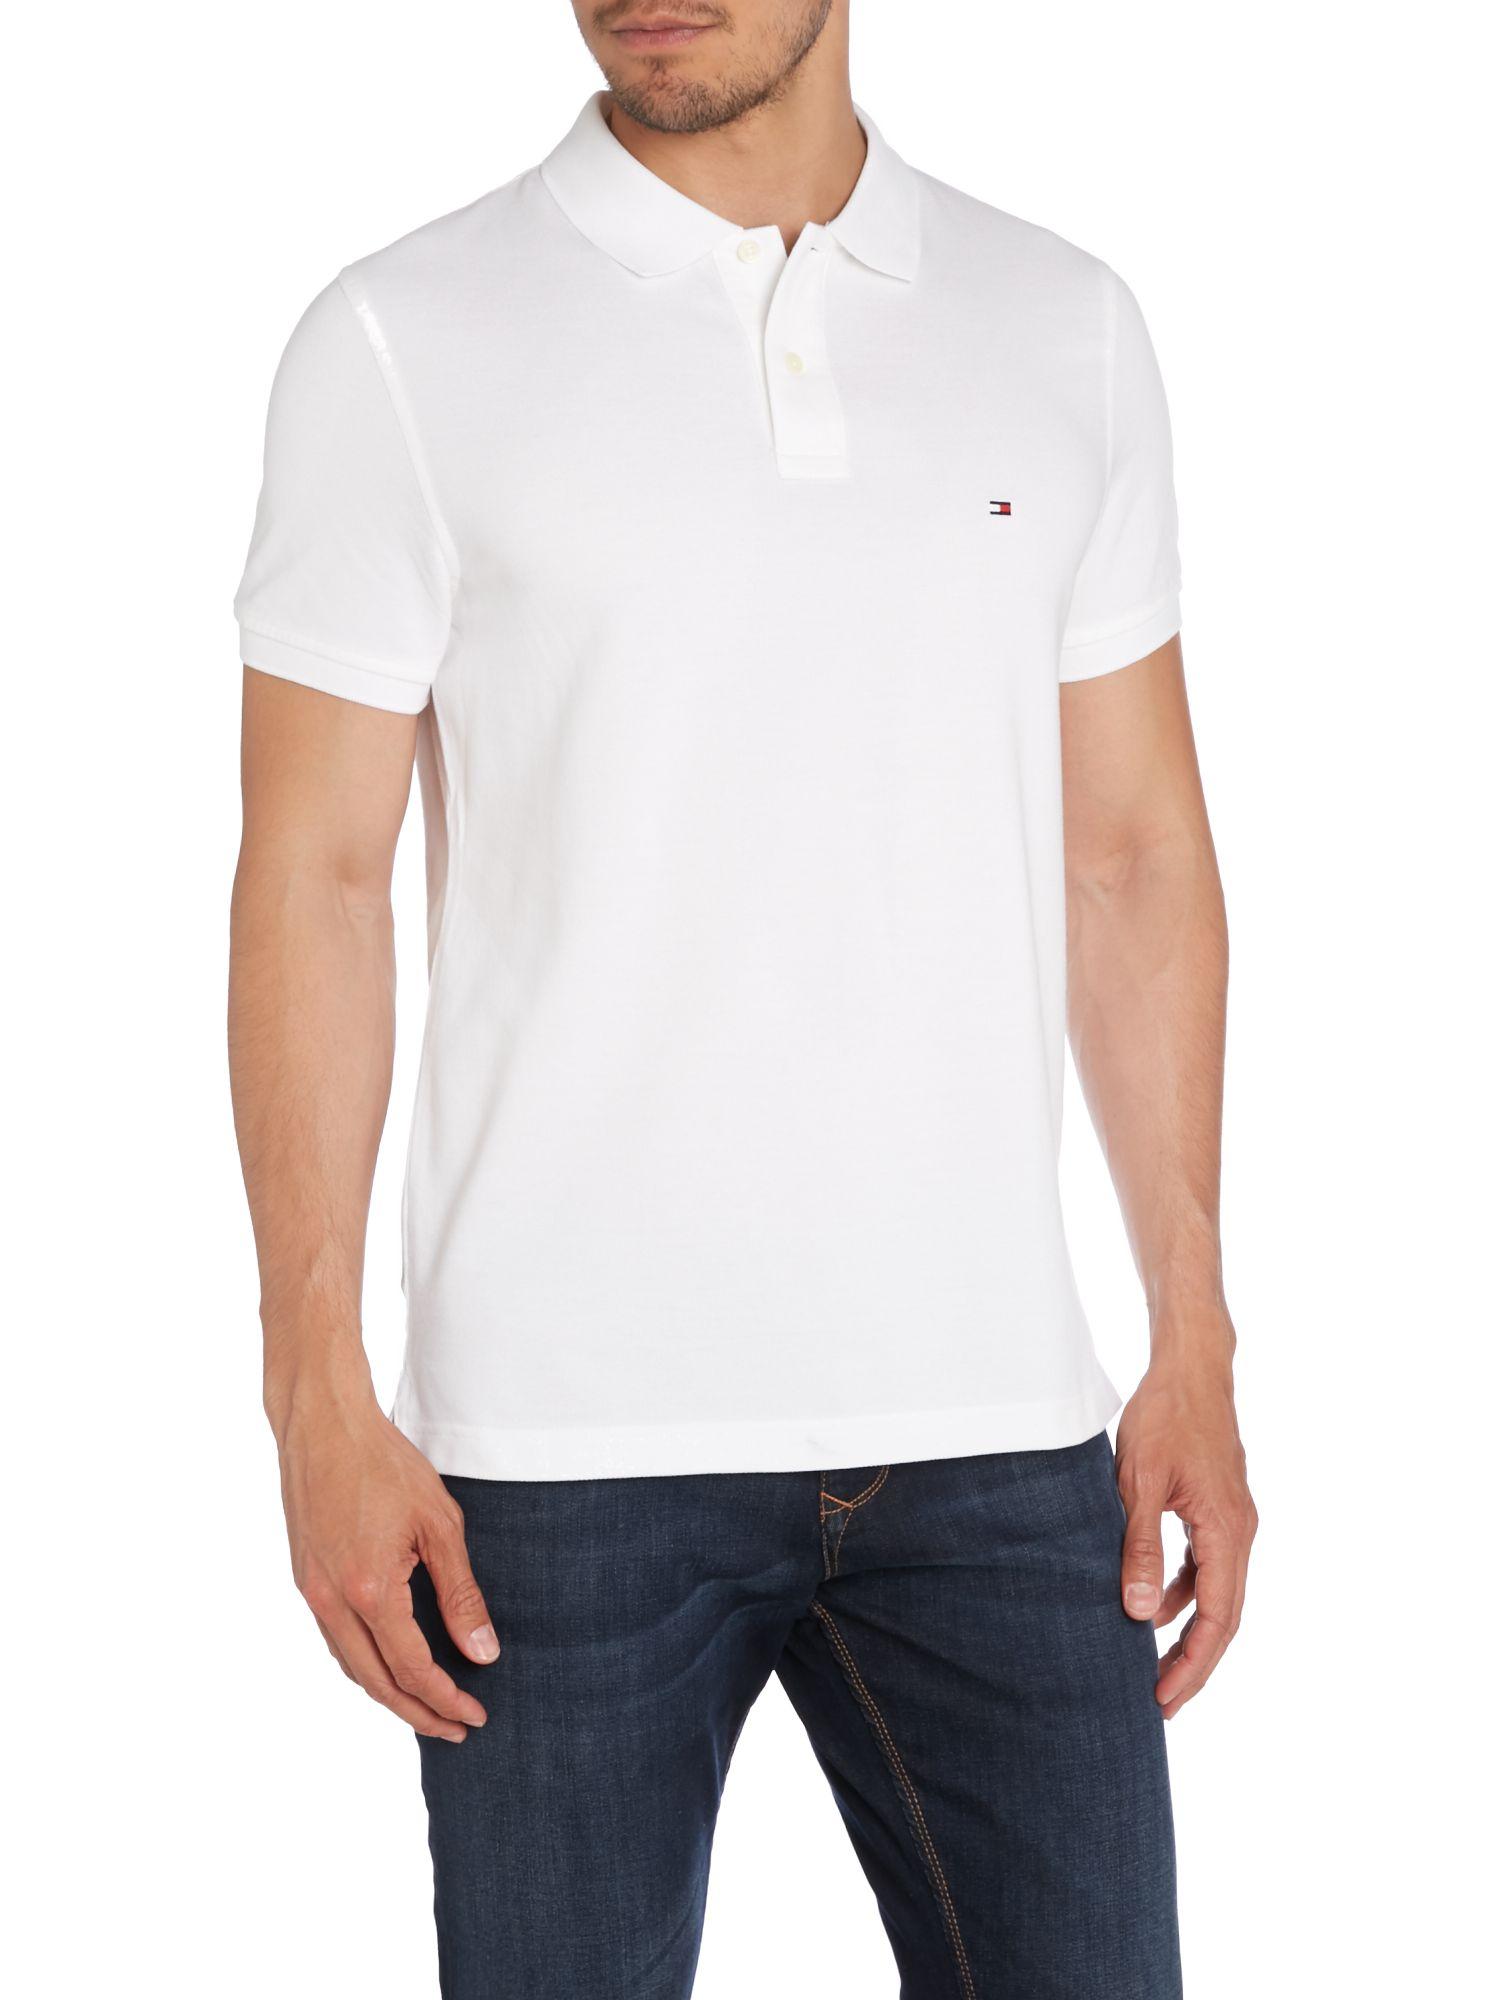 tommy hilfiger slim fit short sleeve polo shirt in white. Black Bedroom Furniture Sets. Home Design Ideas